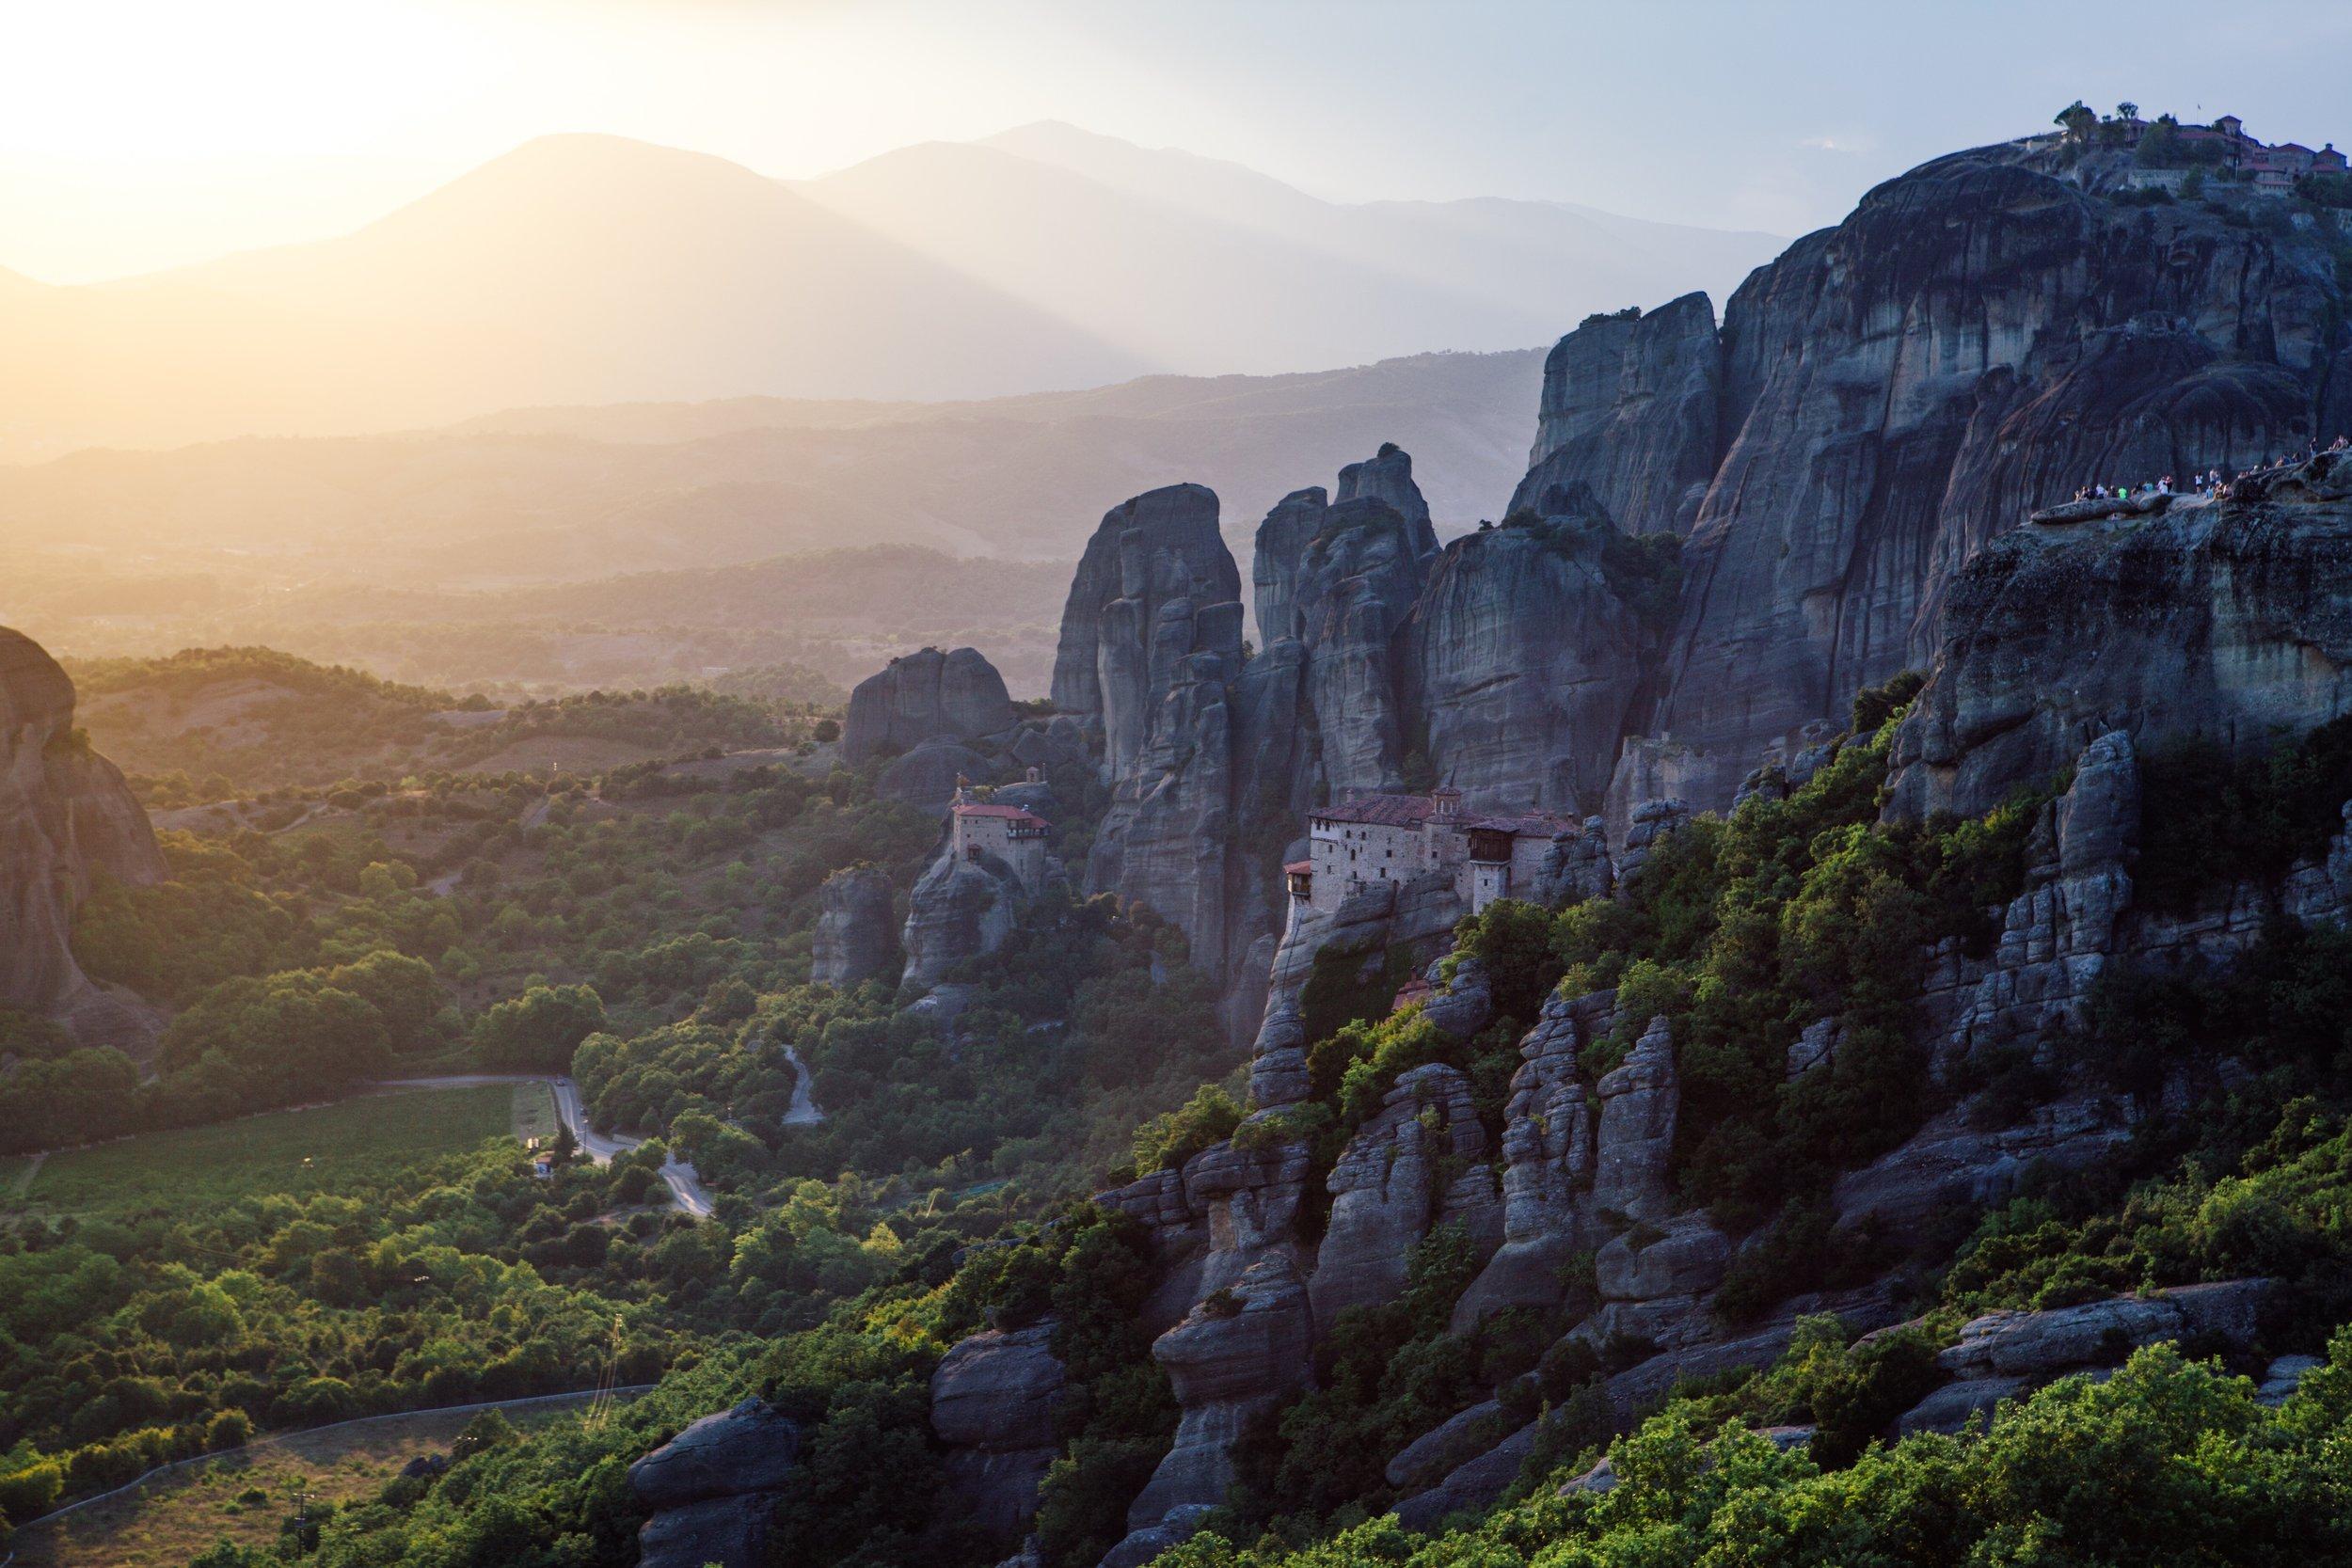 Greek Highlands, West Island - Discover the Wisdom of God's